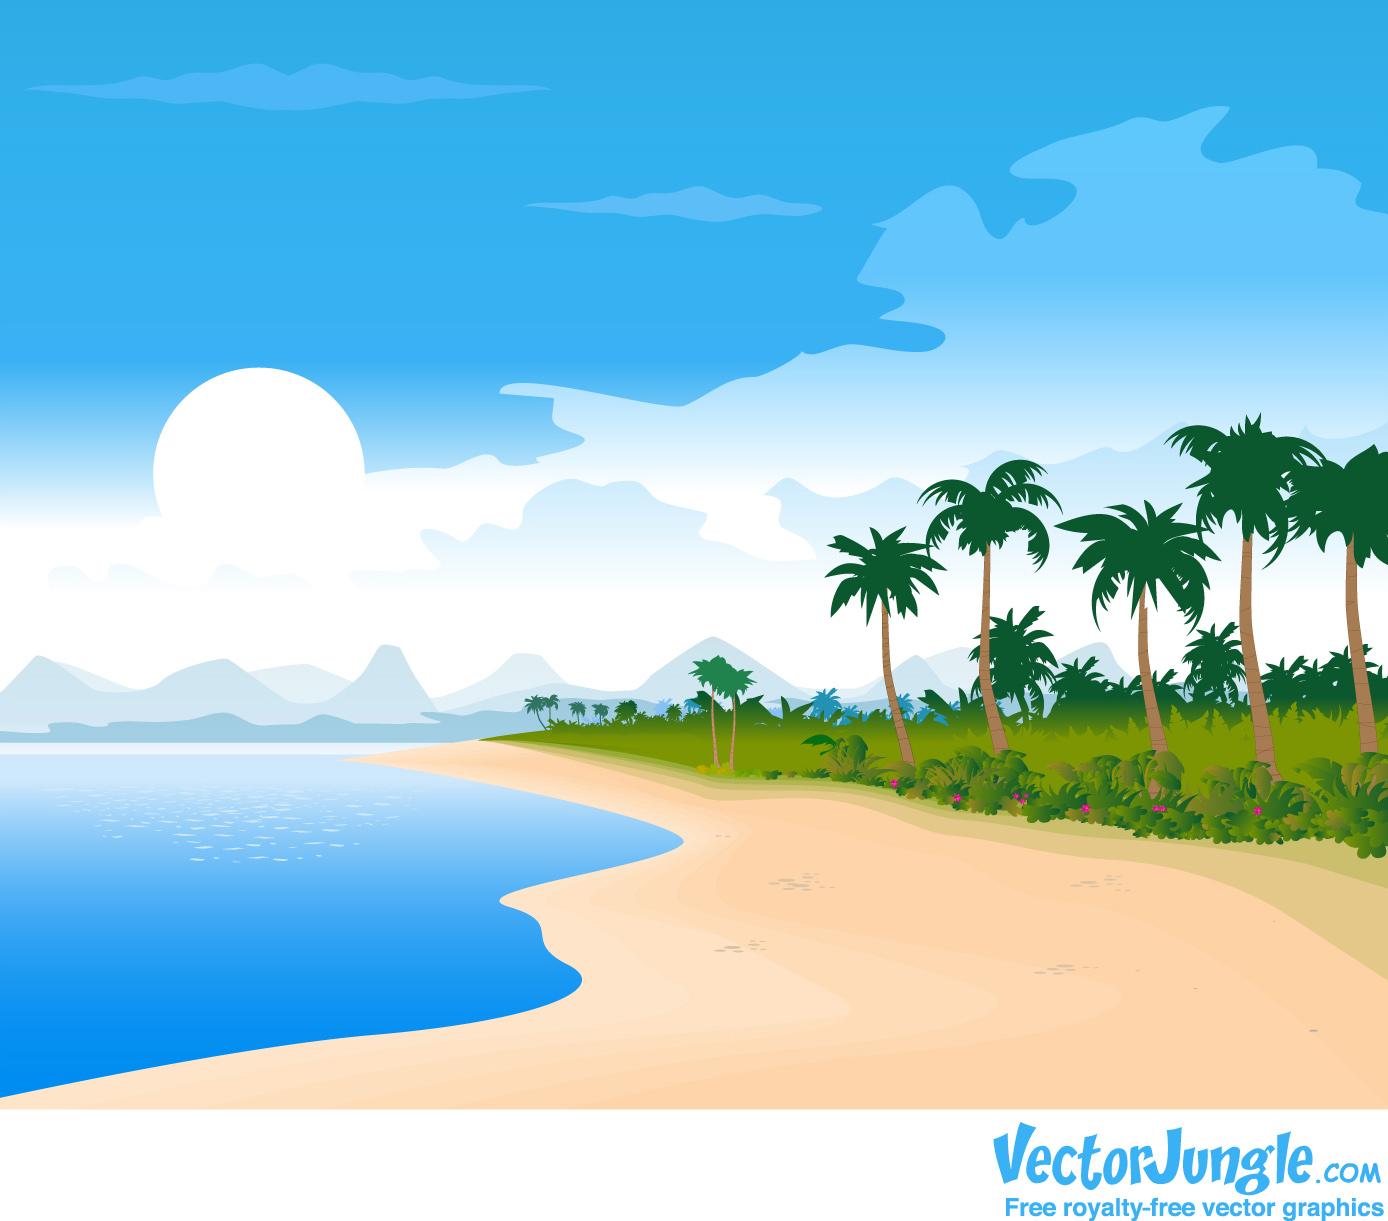 Beach clipart vector. Free cliparts download clip